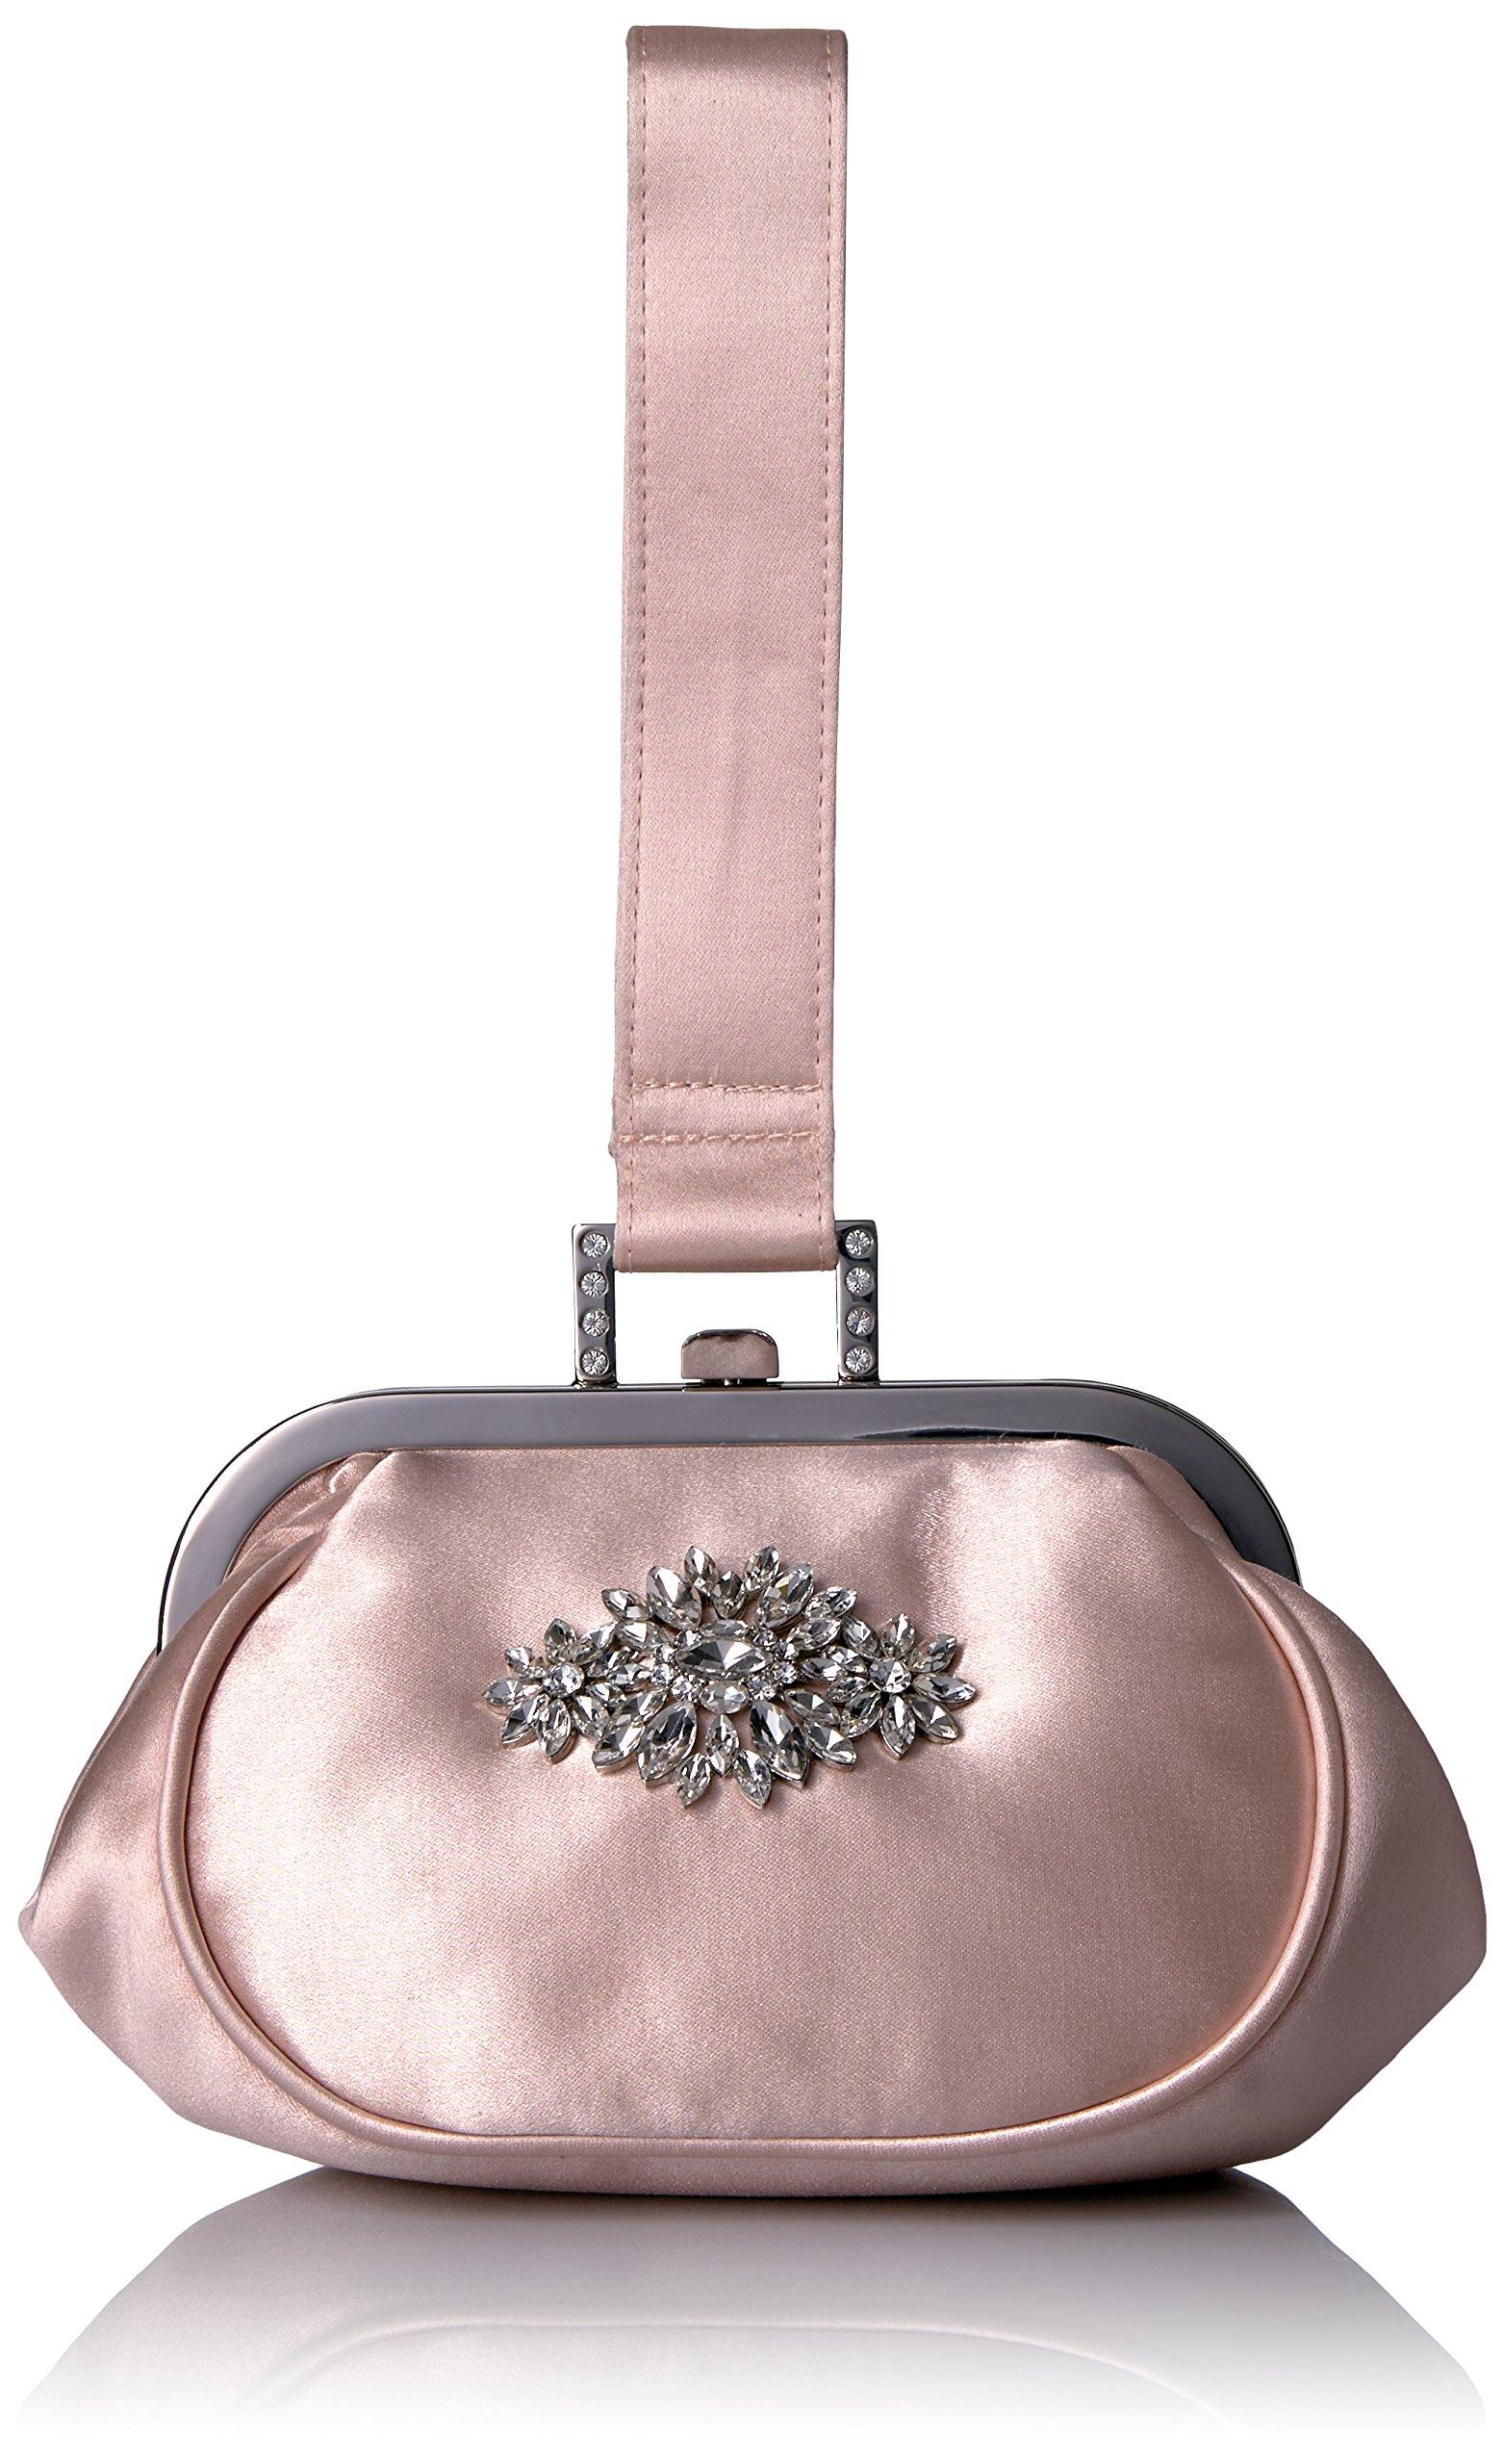 Badgley Mischka Addison, Light Pink by Badgley Mischka